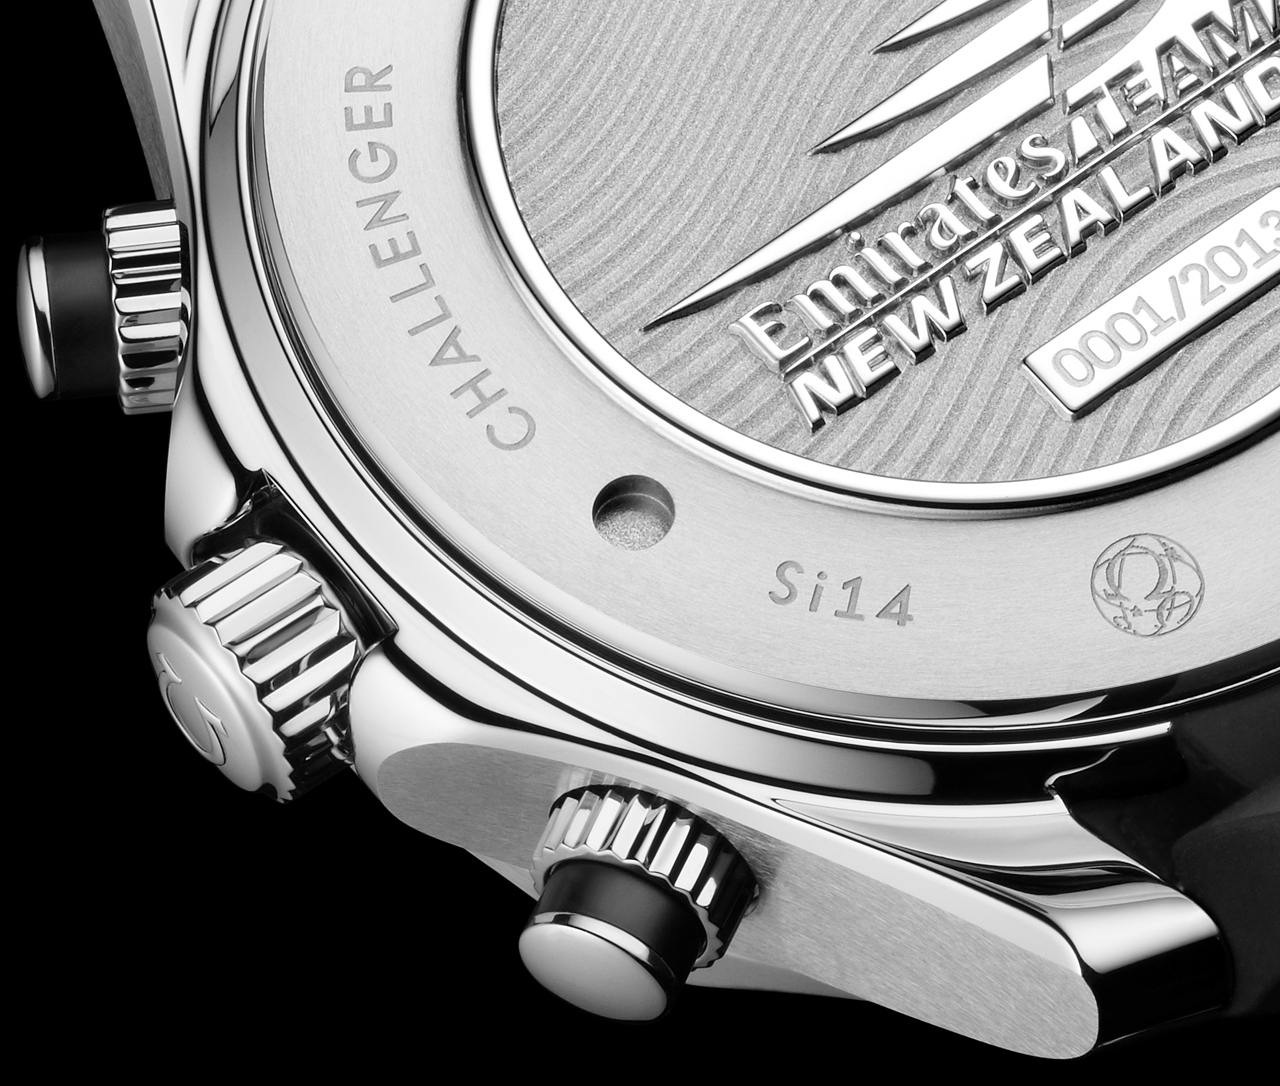 omega-seamaster-diver-etnz-limited-edition_0-100_11